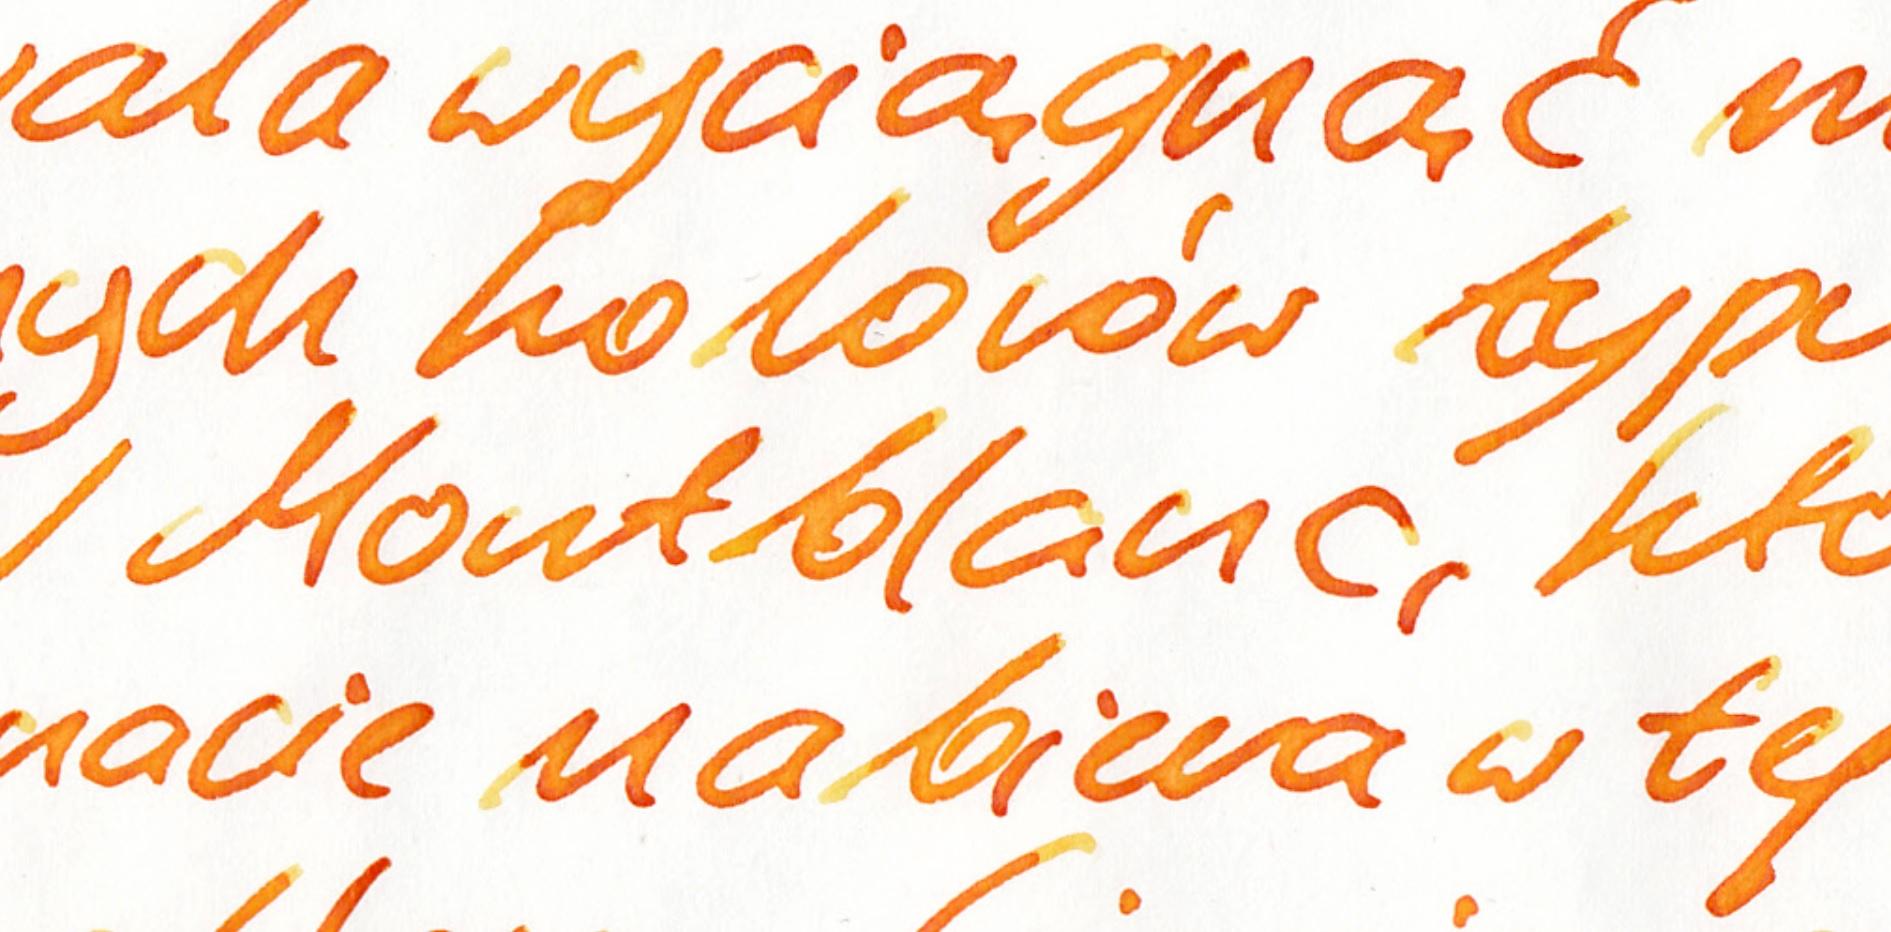 fpn_1459623861__goldenyellow_emotica_2.j